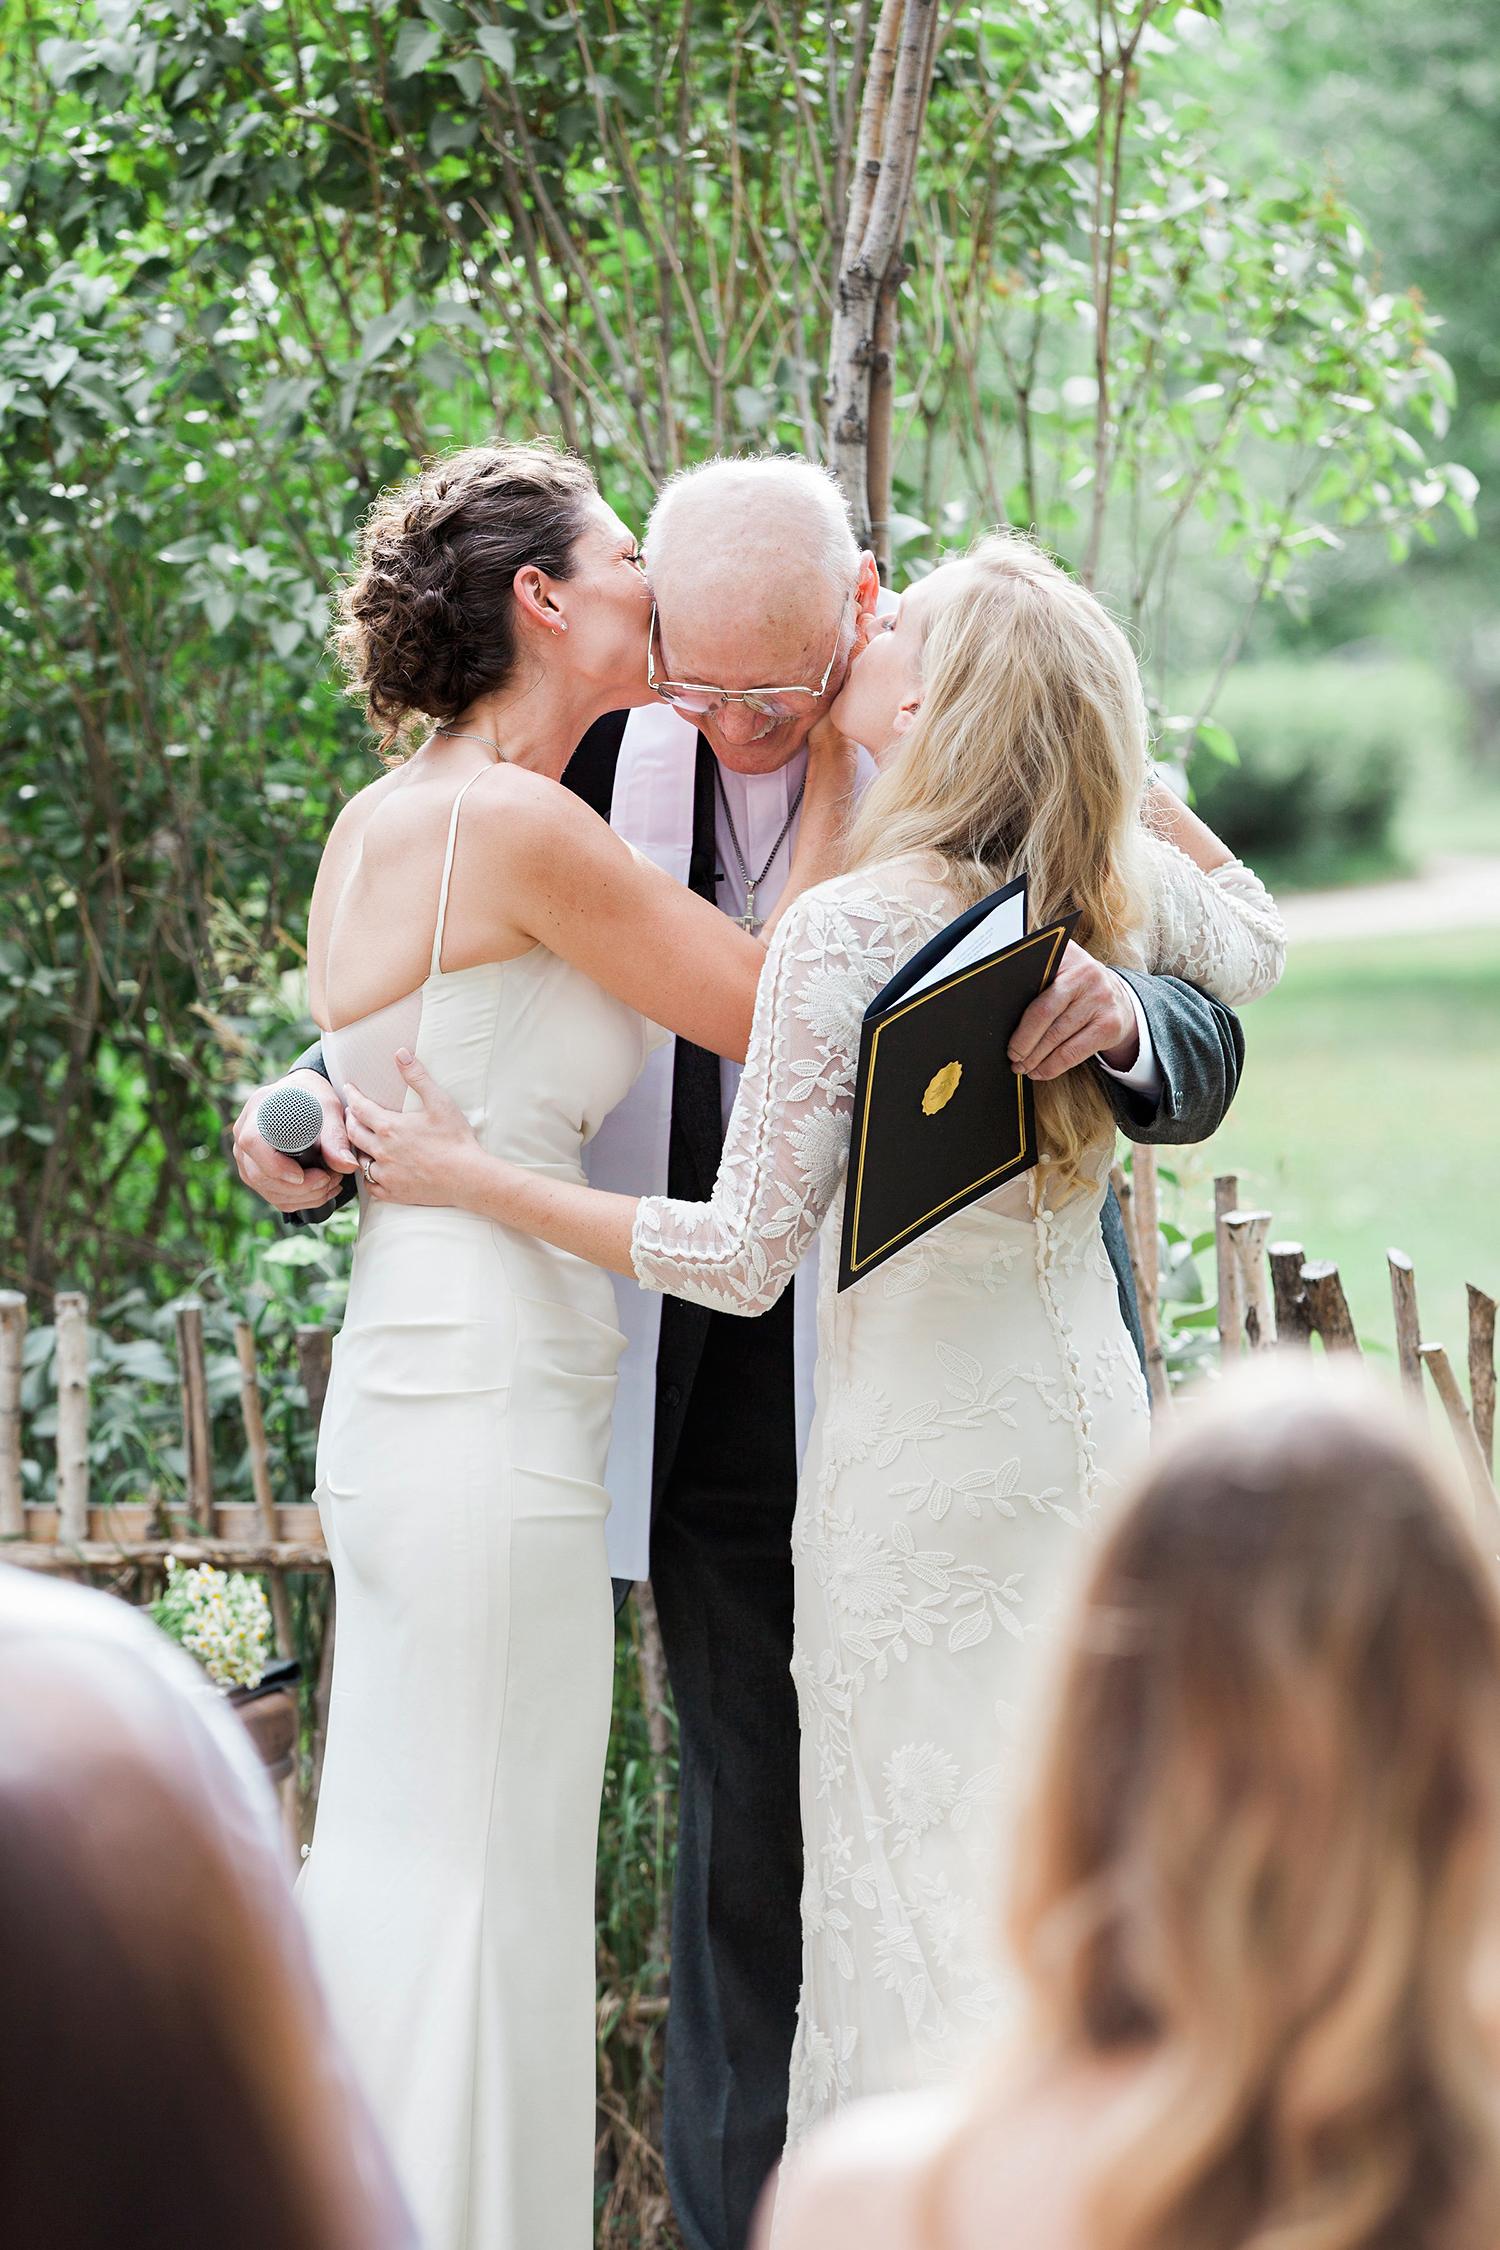 allison aimee wedding kissing officiant on cheeks